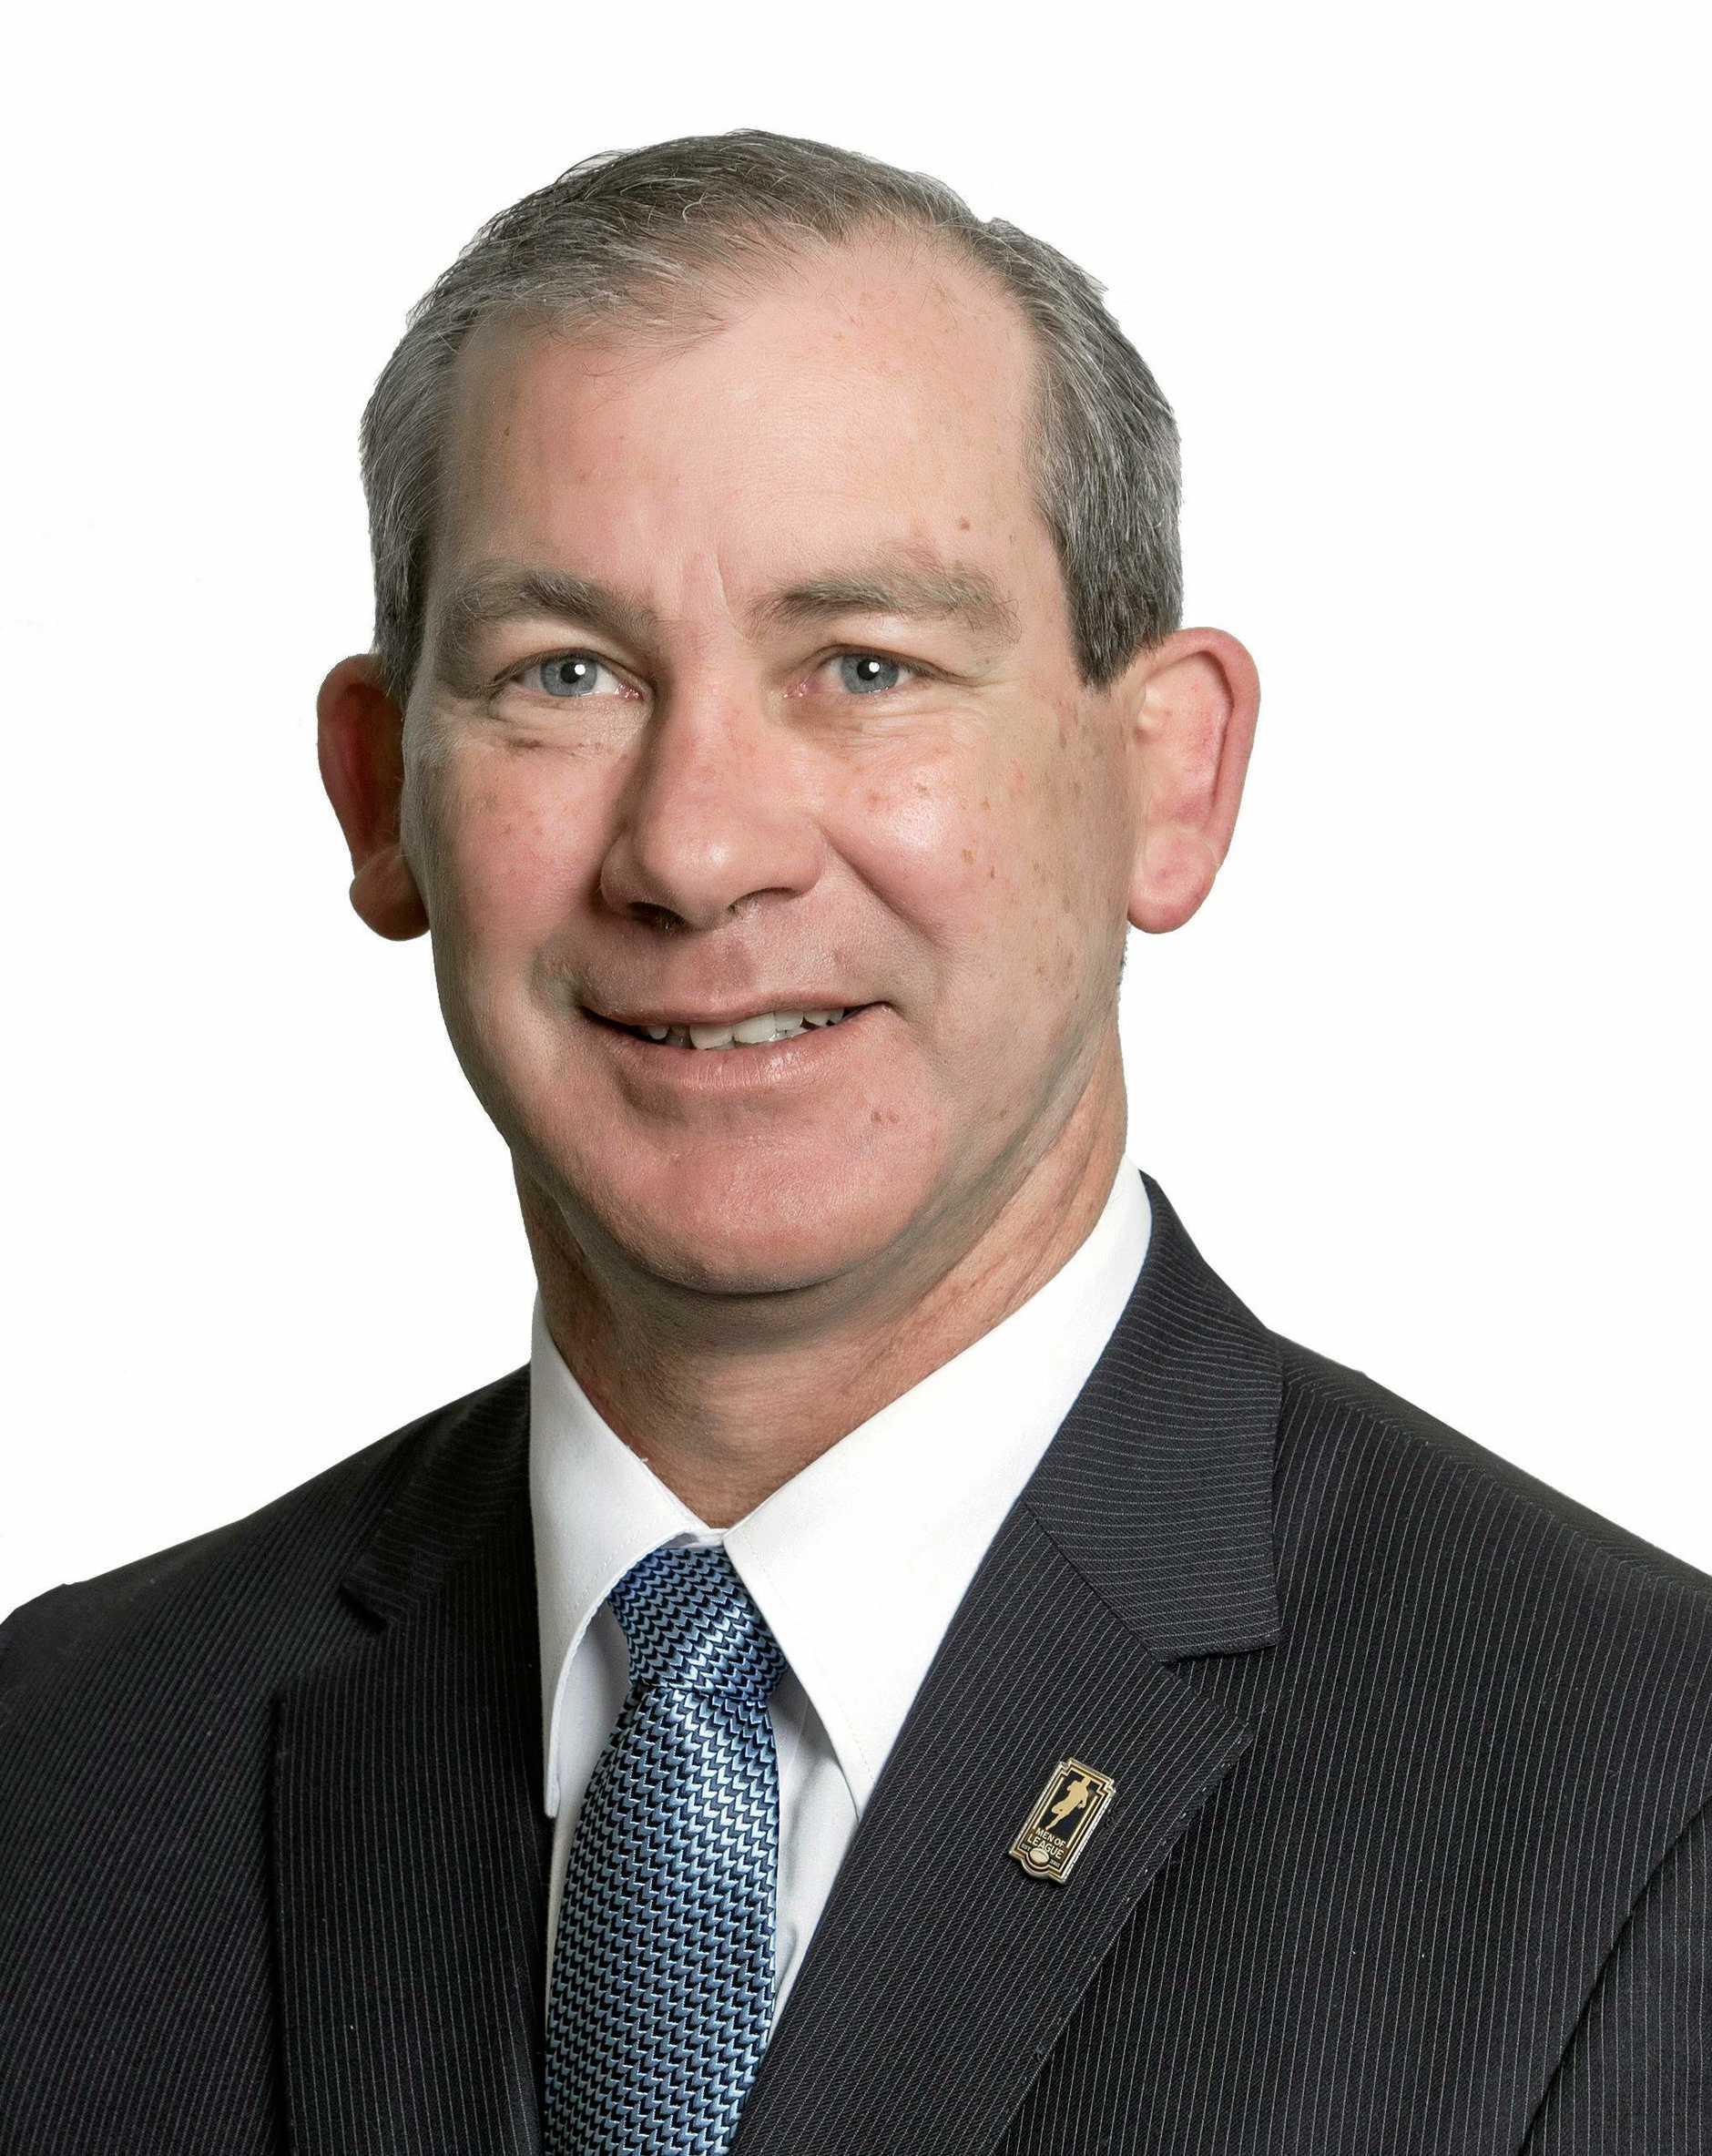 Mick Curran